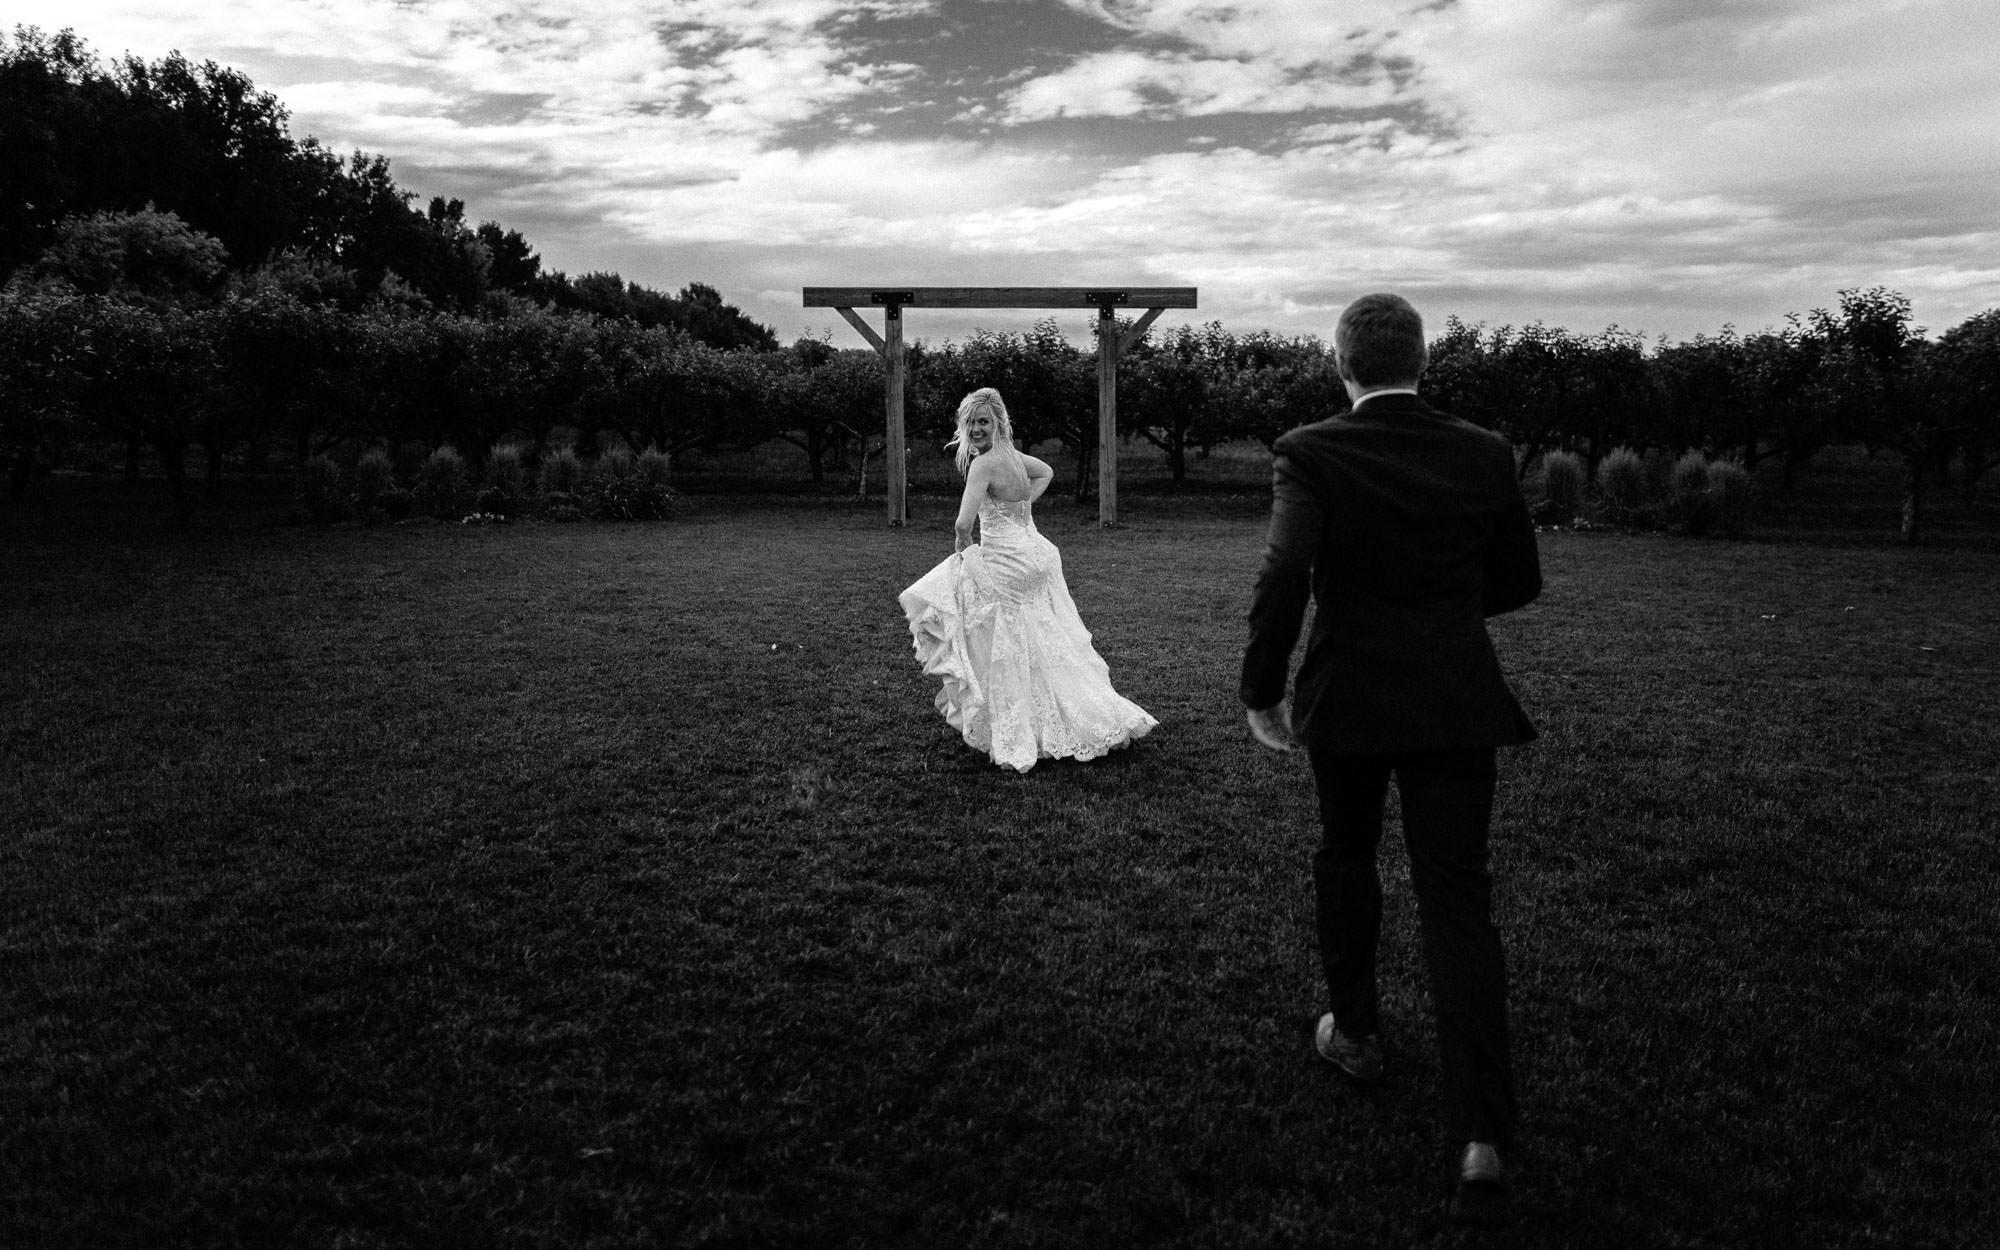 meadow-barn-wedding-sioux-falls-south-dakota-romantic-adventerous-michael-liedtke-photography082.jpg